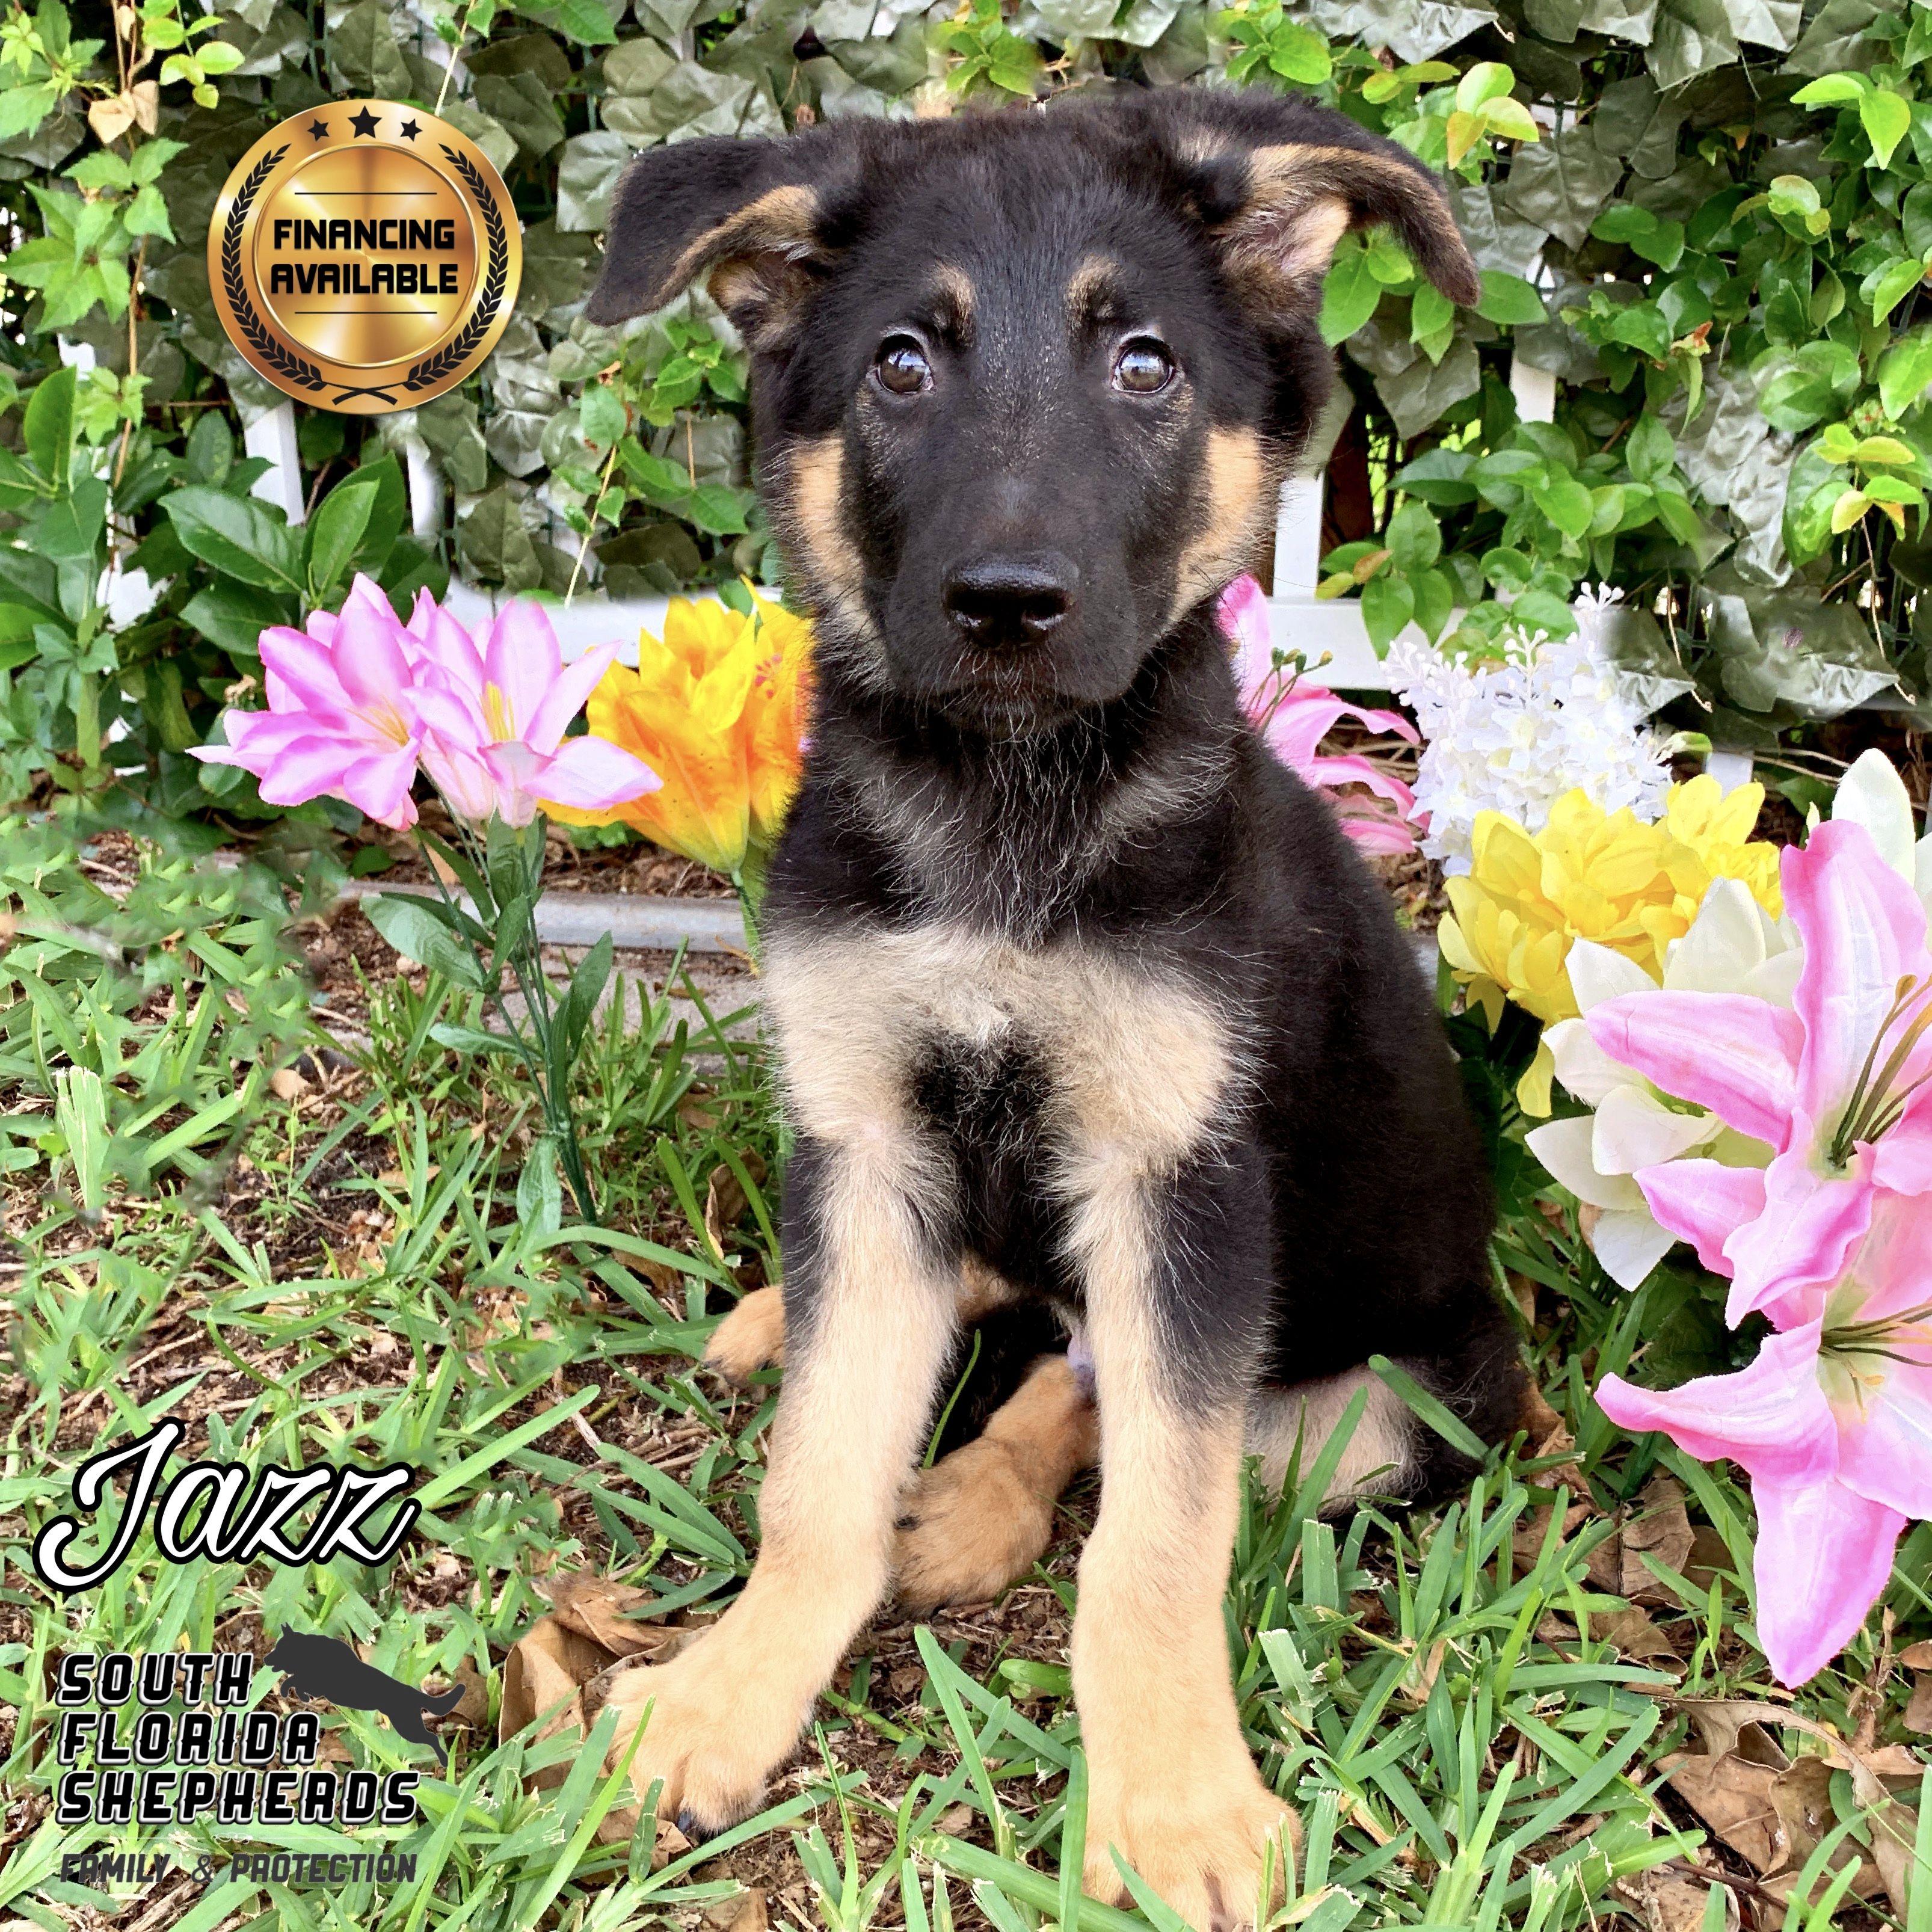 South Florida German Shepherds a world class German